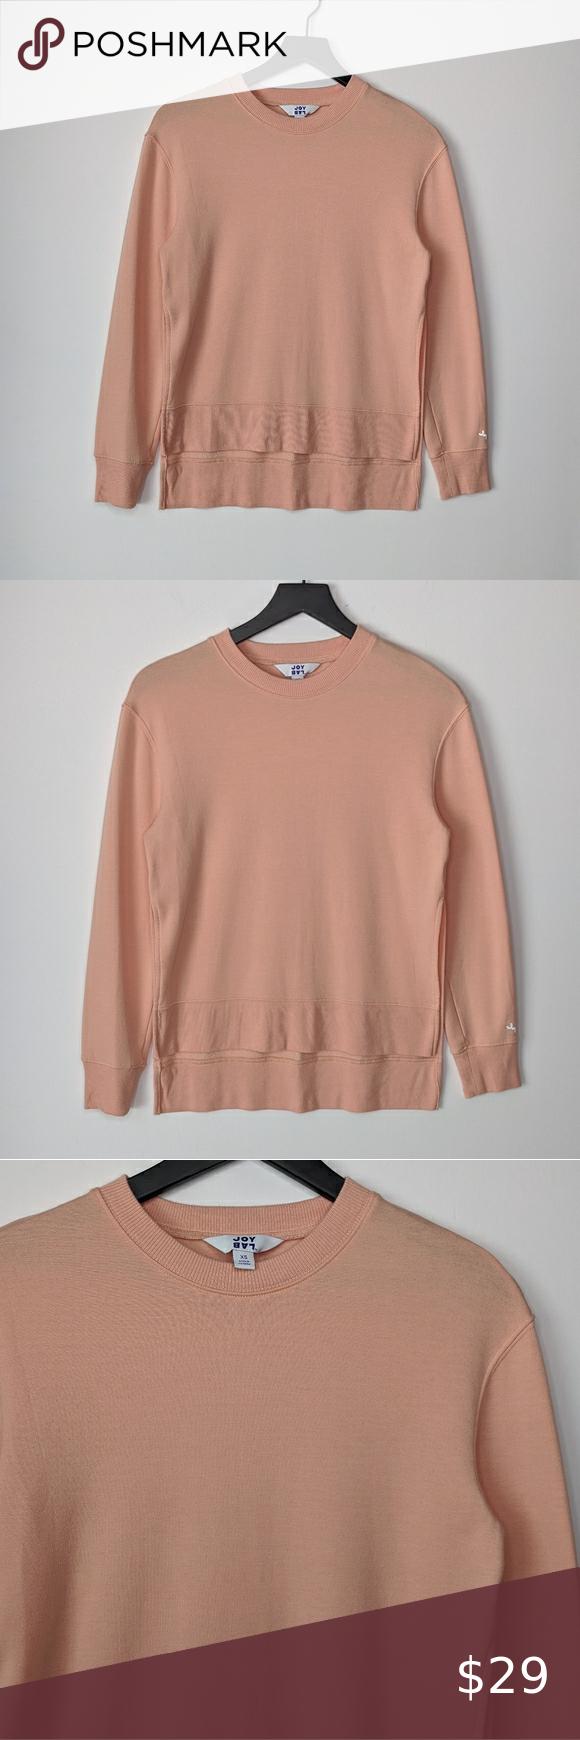 Joylab Peach Crew Neck Sweatshirt With Side Slits Crew Neck Sweatshirt Sweatshirts Joylab [ 1740 x 580 Pixel ]